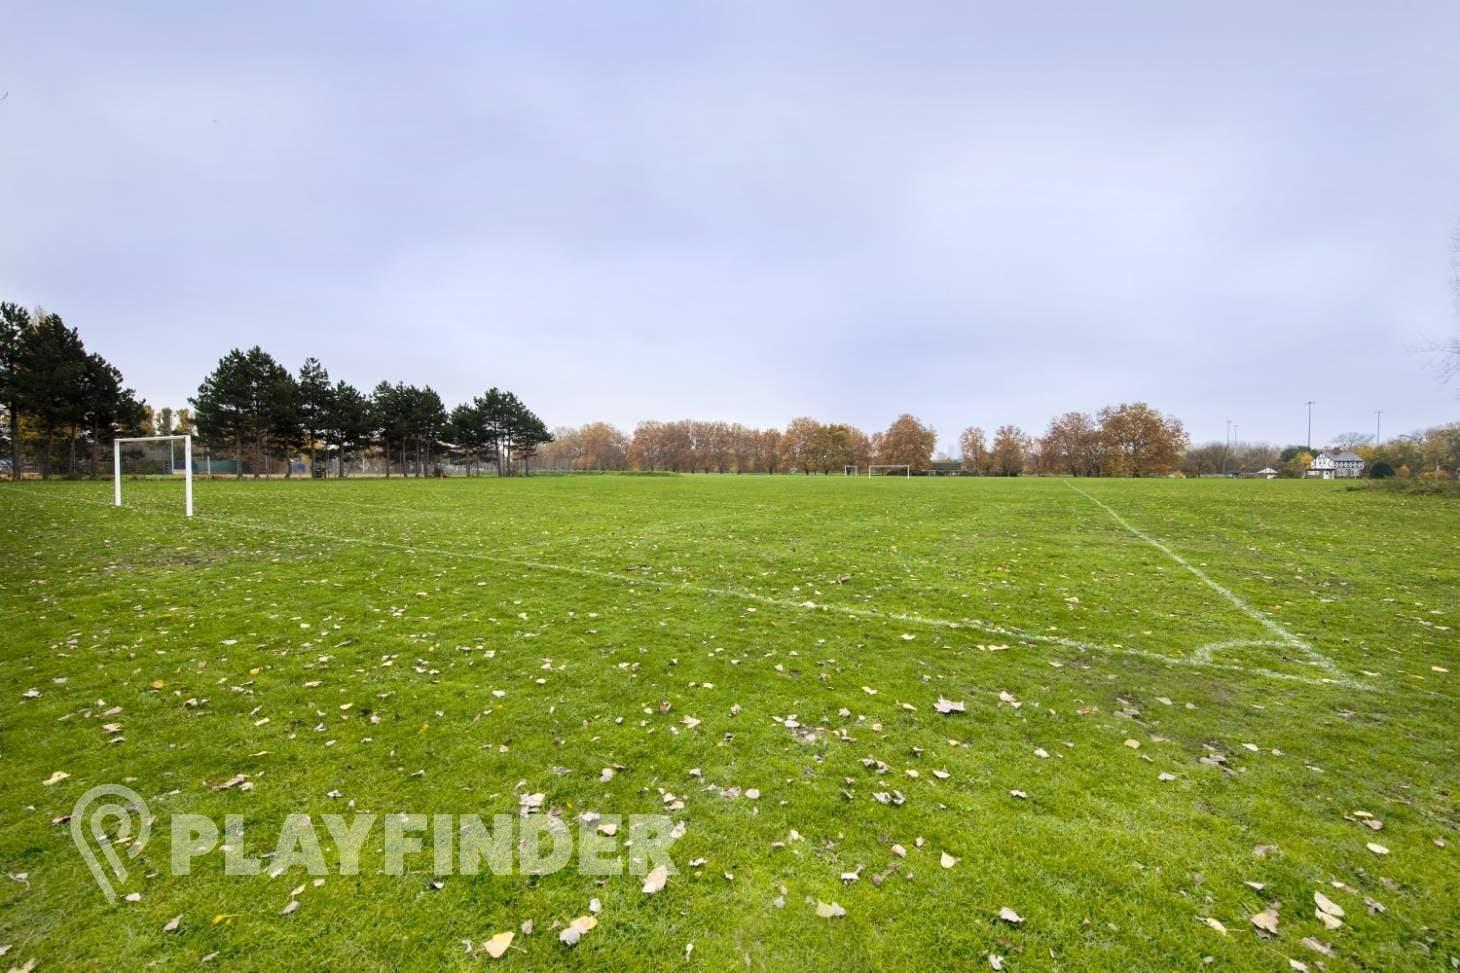 Jubilee Park 11 a side junior | Grass football pitch